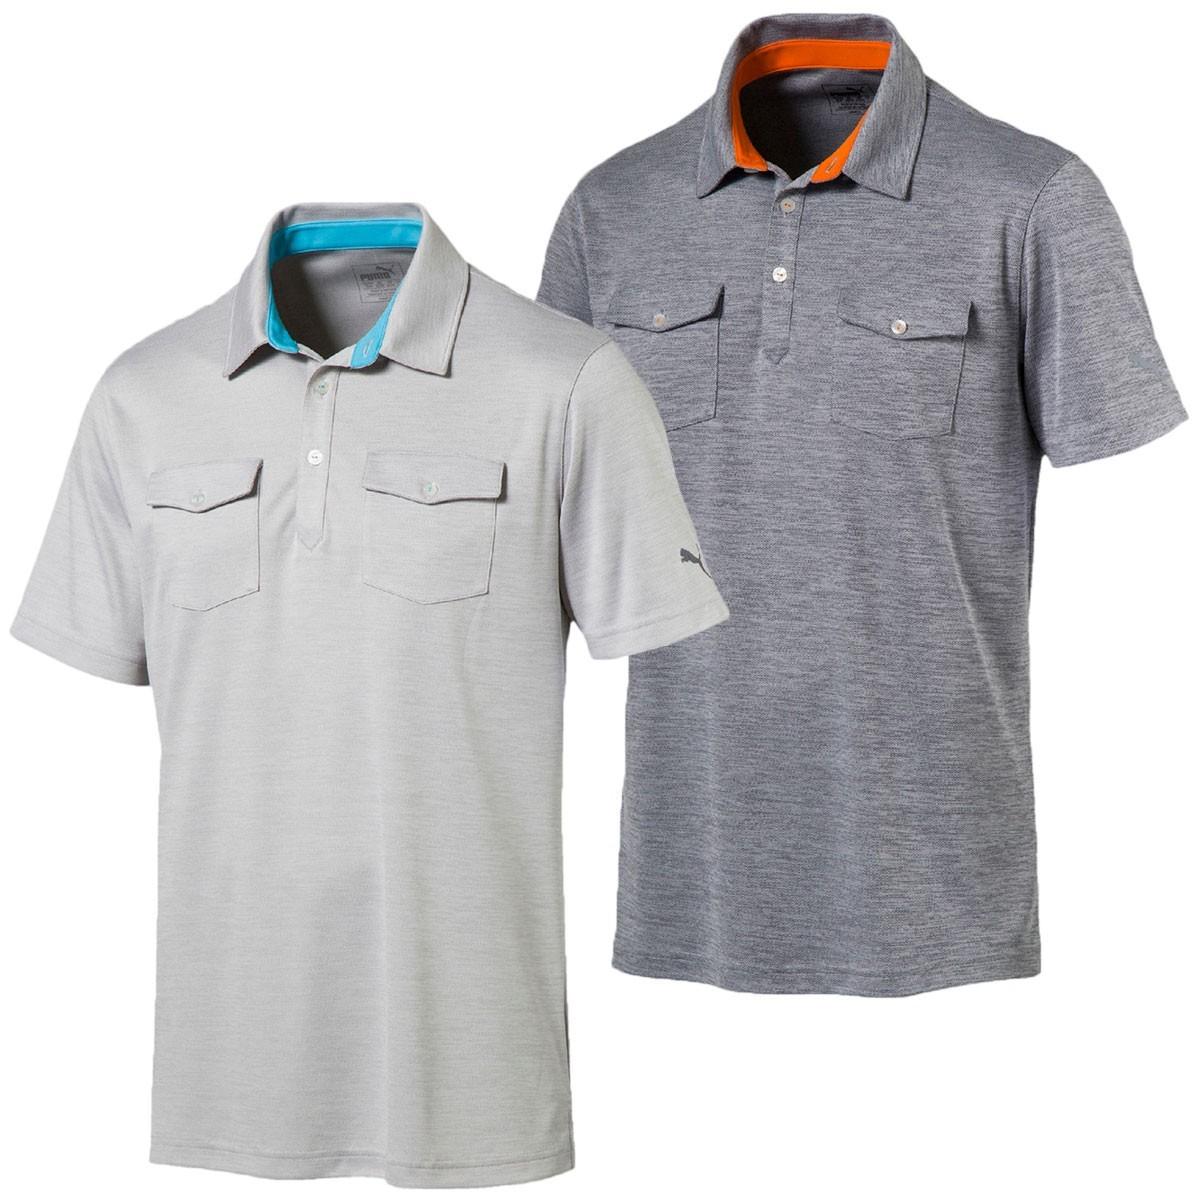 Puma golf 2017 mens tailored double pocket polo shirt for Two pocket polo shirt